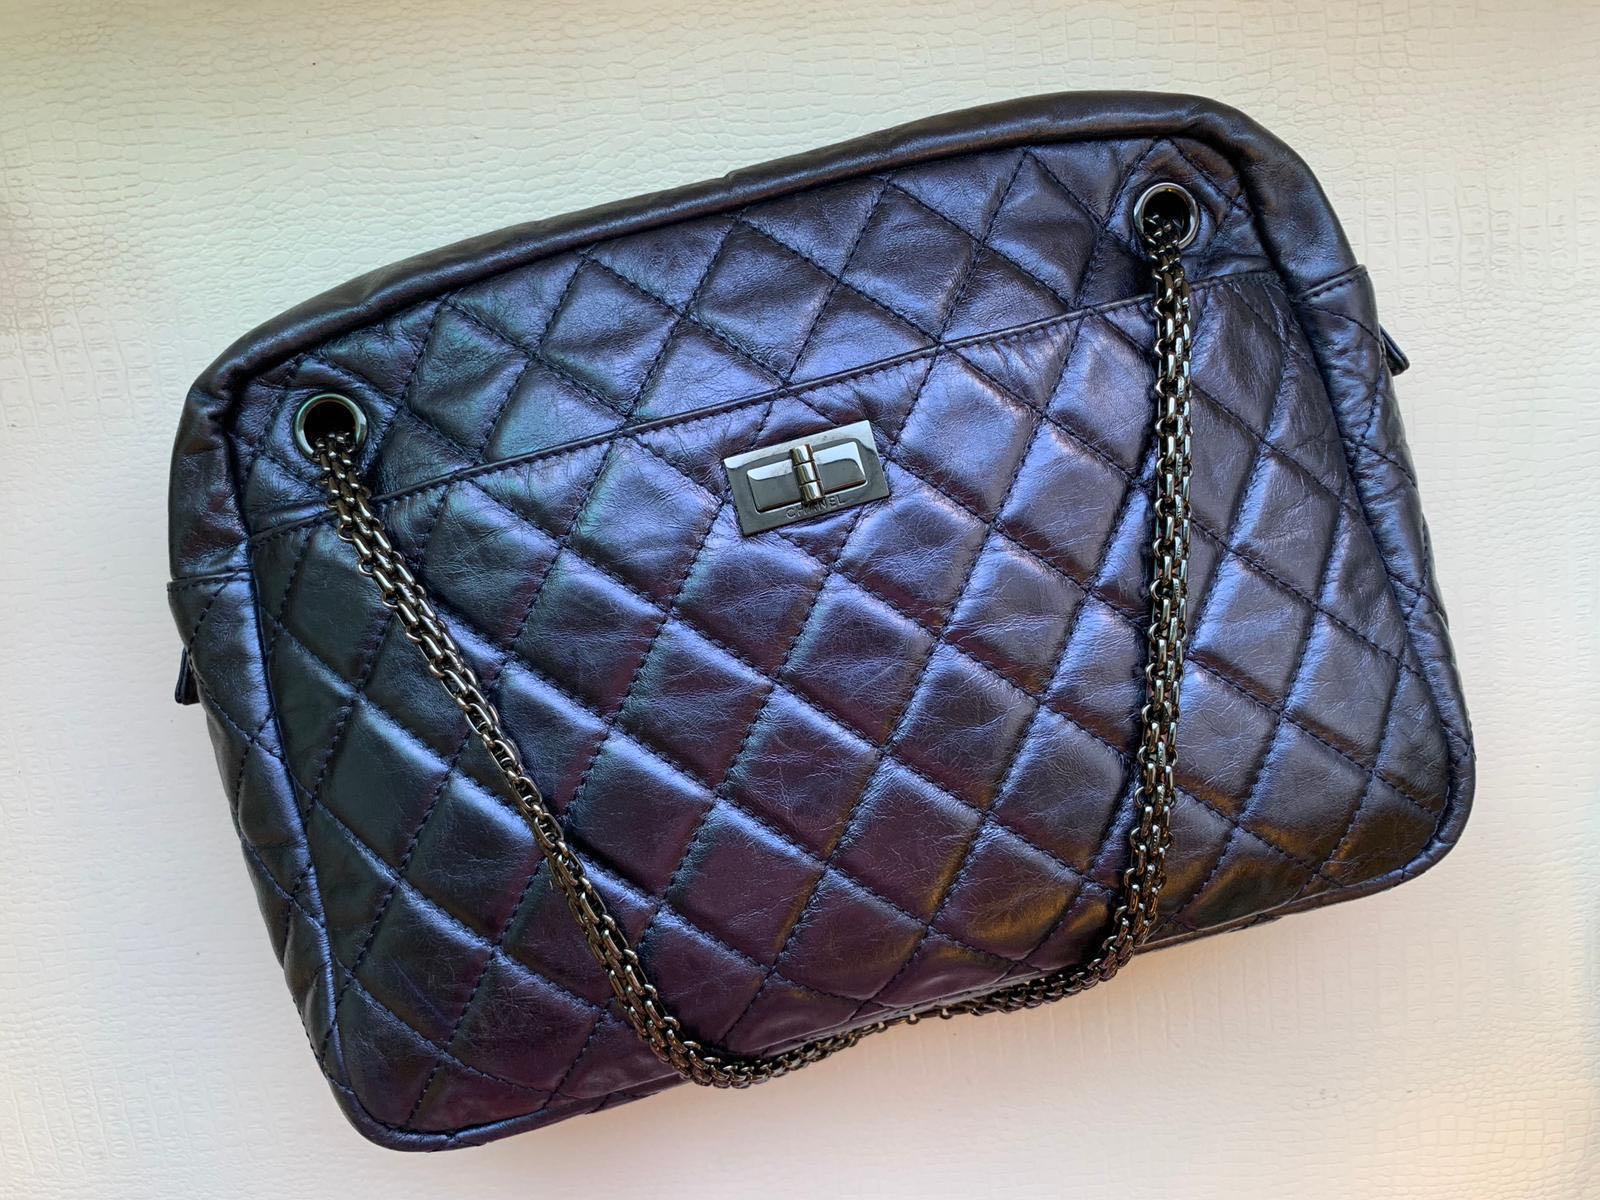 38dff70c113c ChAnel reissue camera bag in gorgeous metallic purple, Women's ...